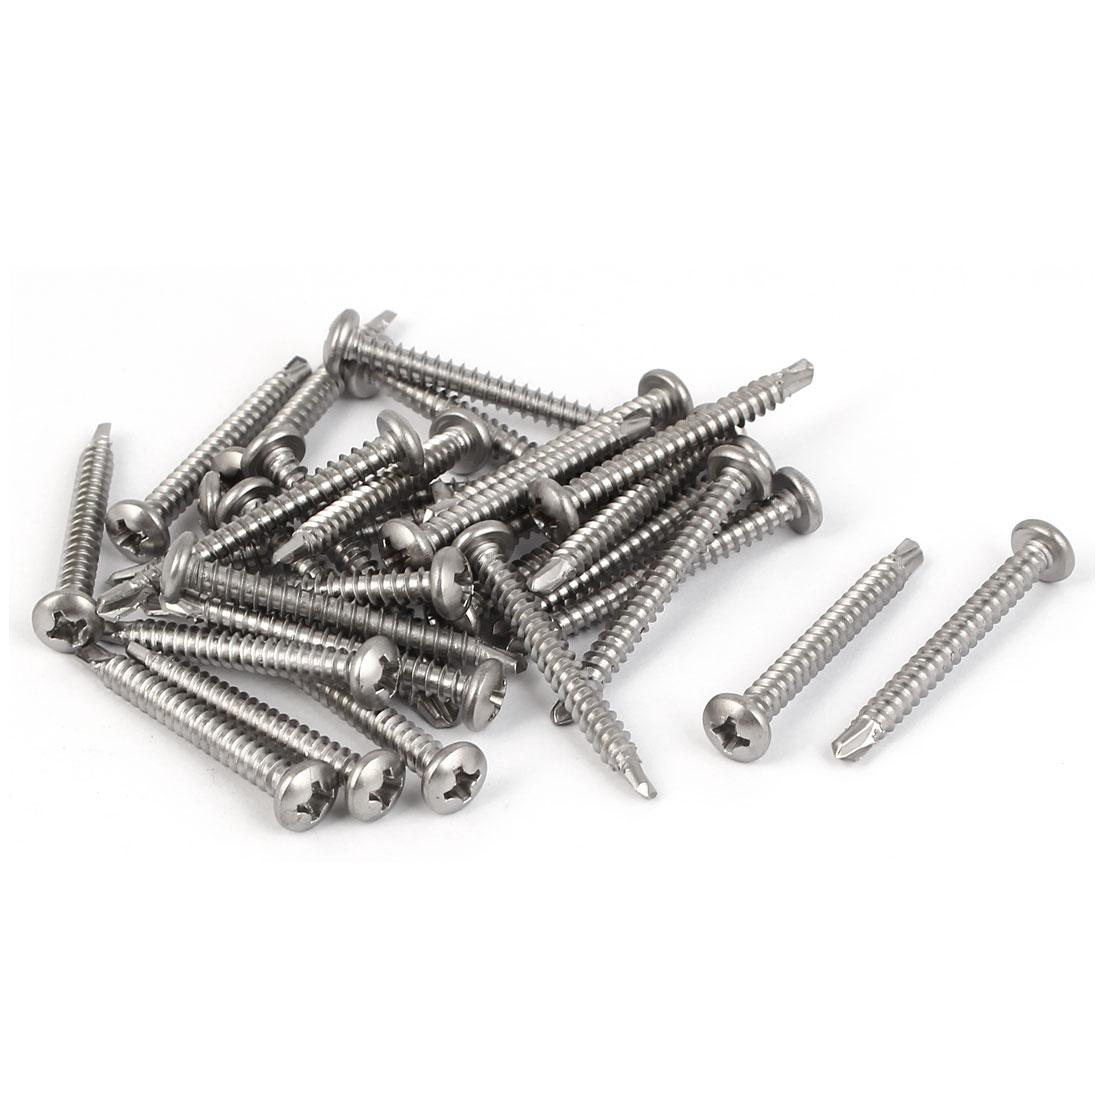 M3.5x32mm #6-20 Male Thread Phillips Pan Head Self Tapping Drilling Screw 30 Pcs